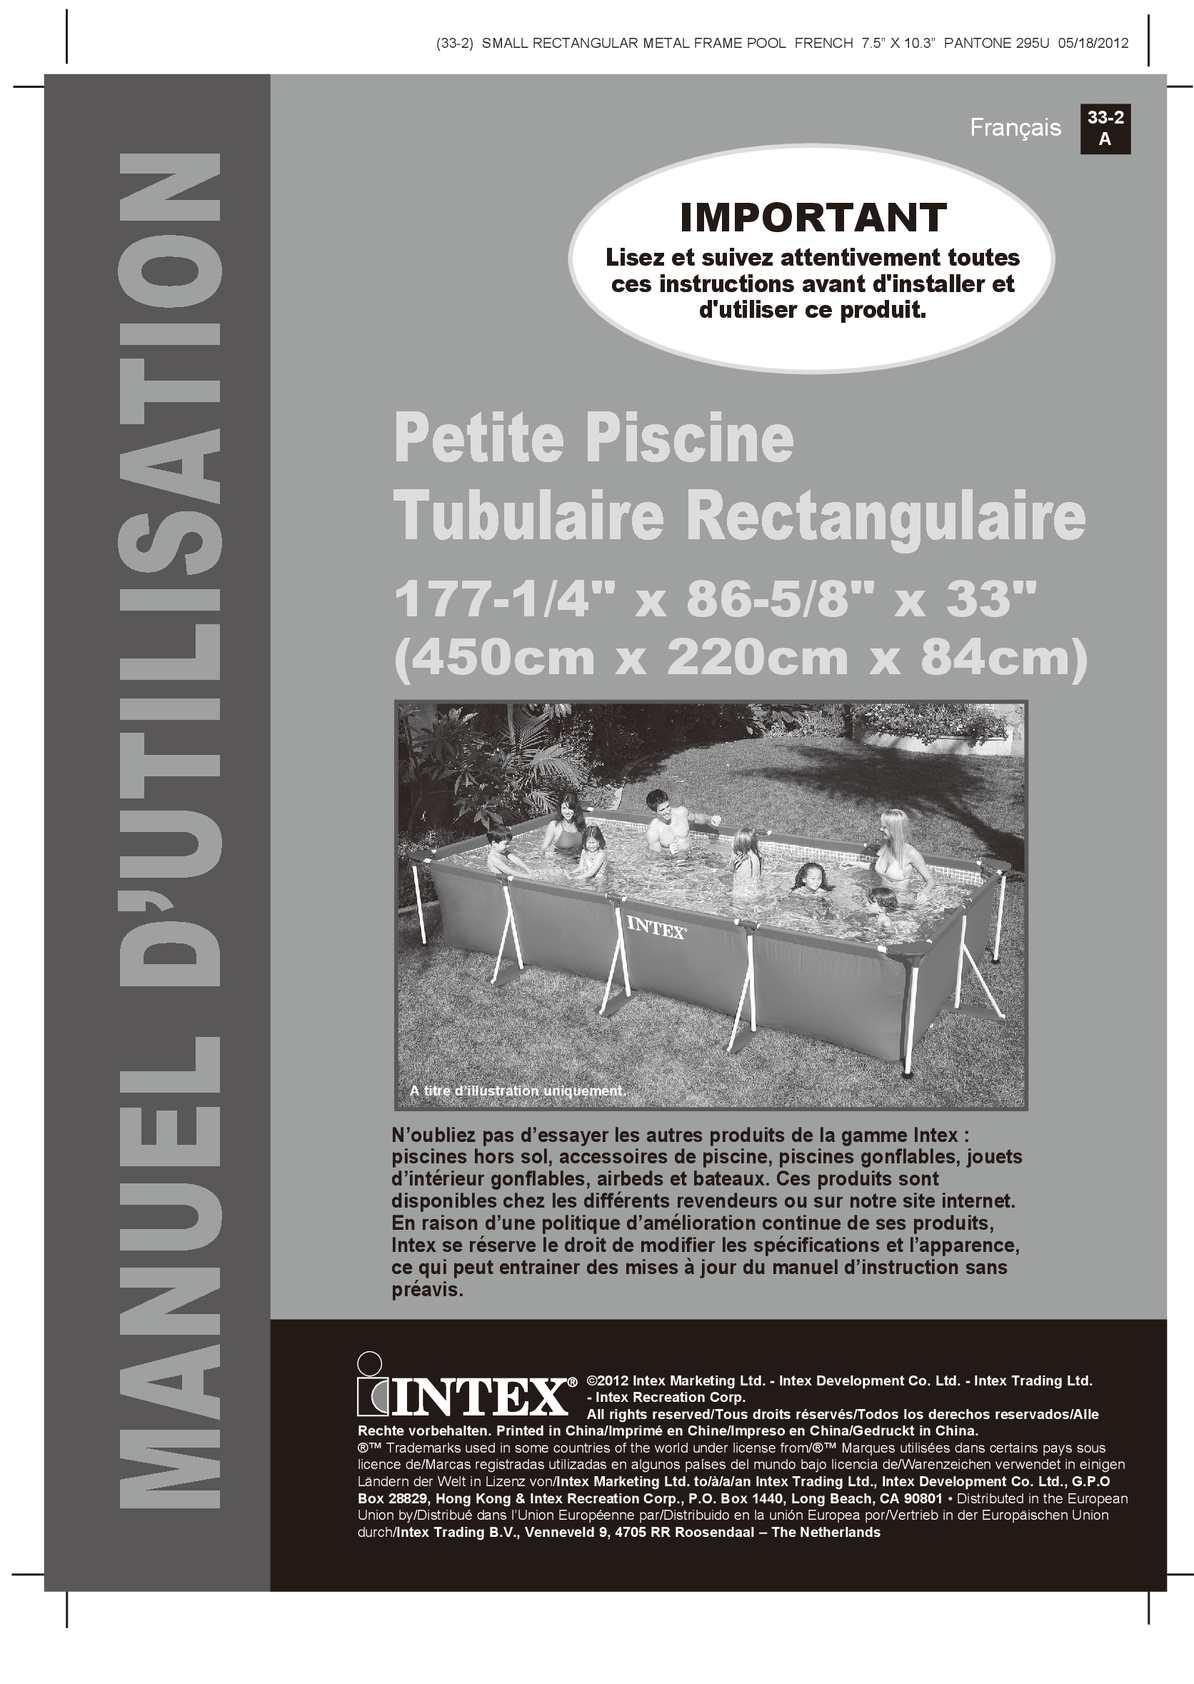 Calam o notice de montage piscine tubulaire intex metal - Petite piscine tubulaire ...